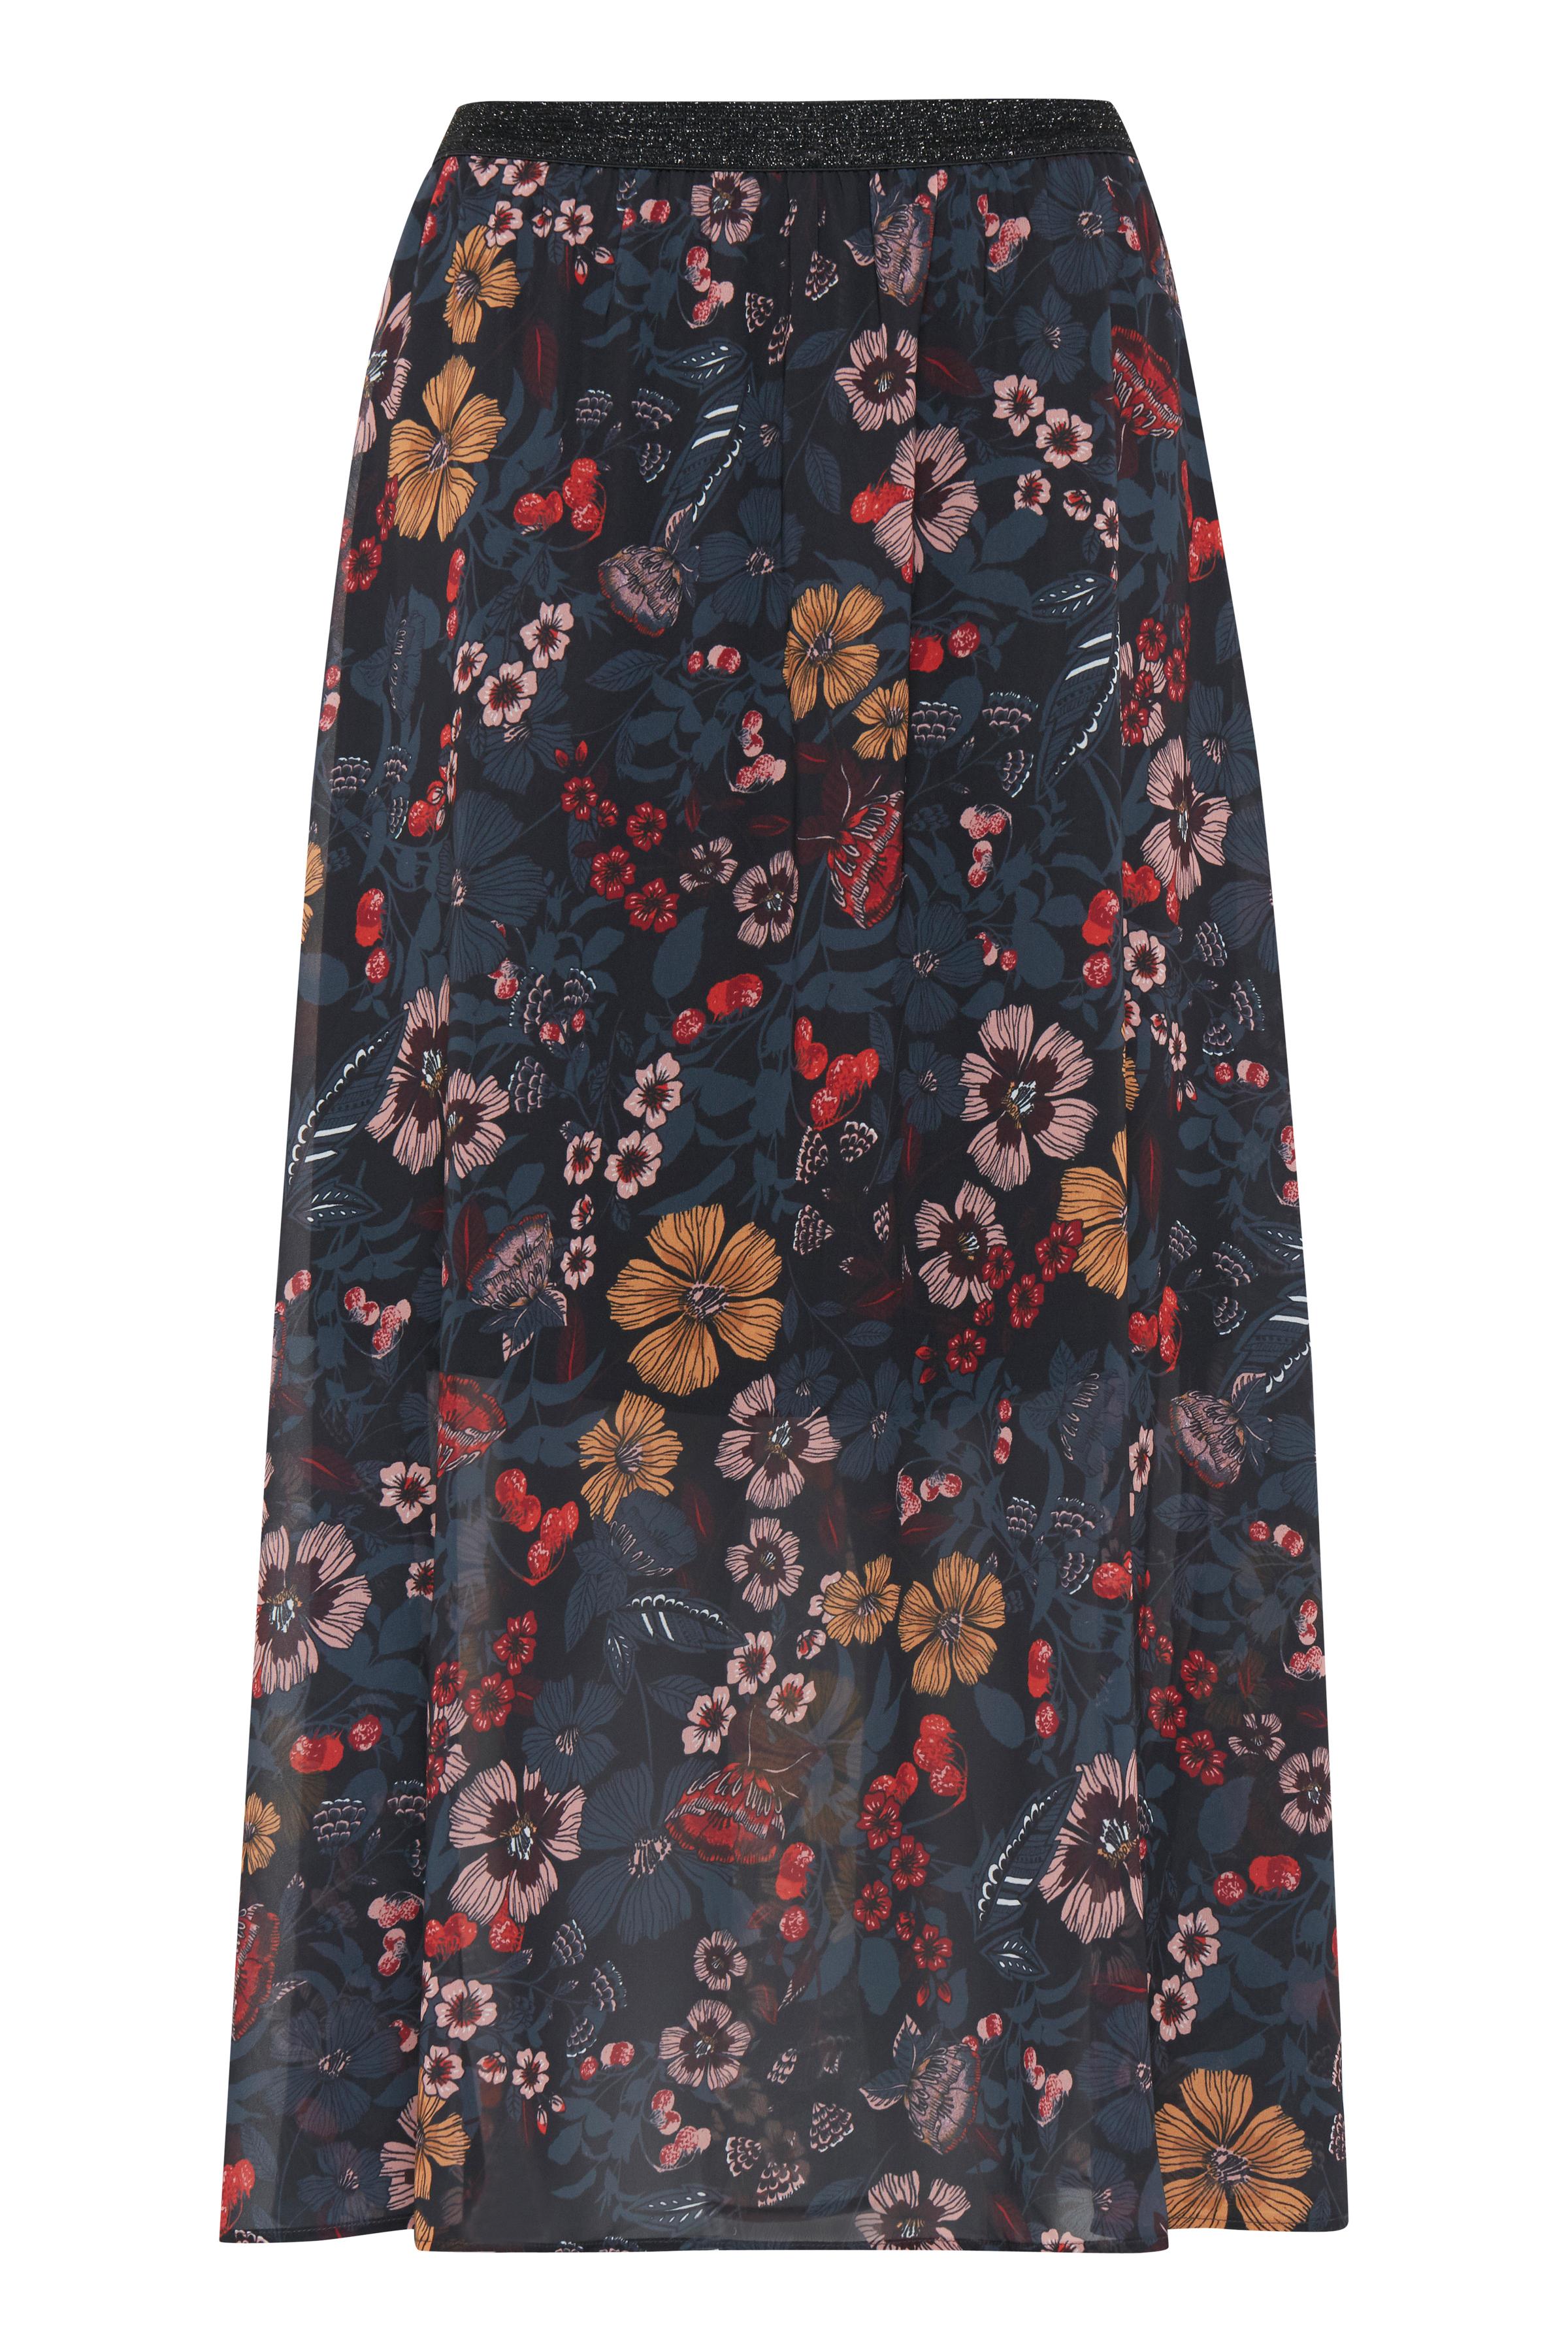 Black print COMBI 1 Skirt from b.young – Buy Black print COMBI 1 Skirt from size 34-46 here